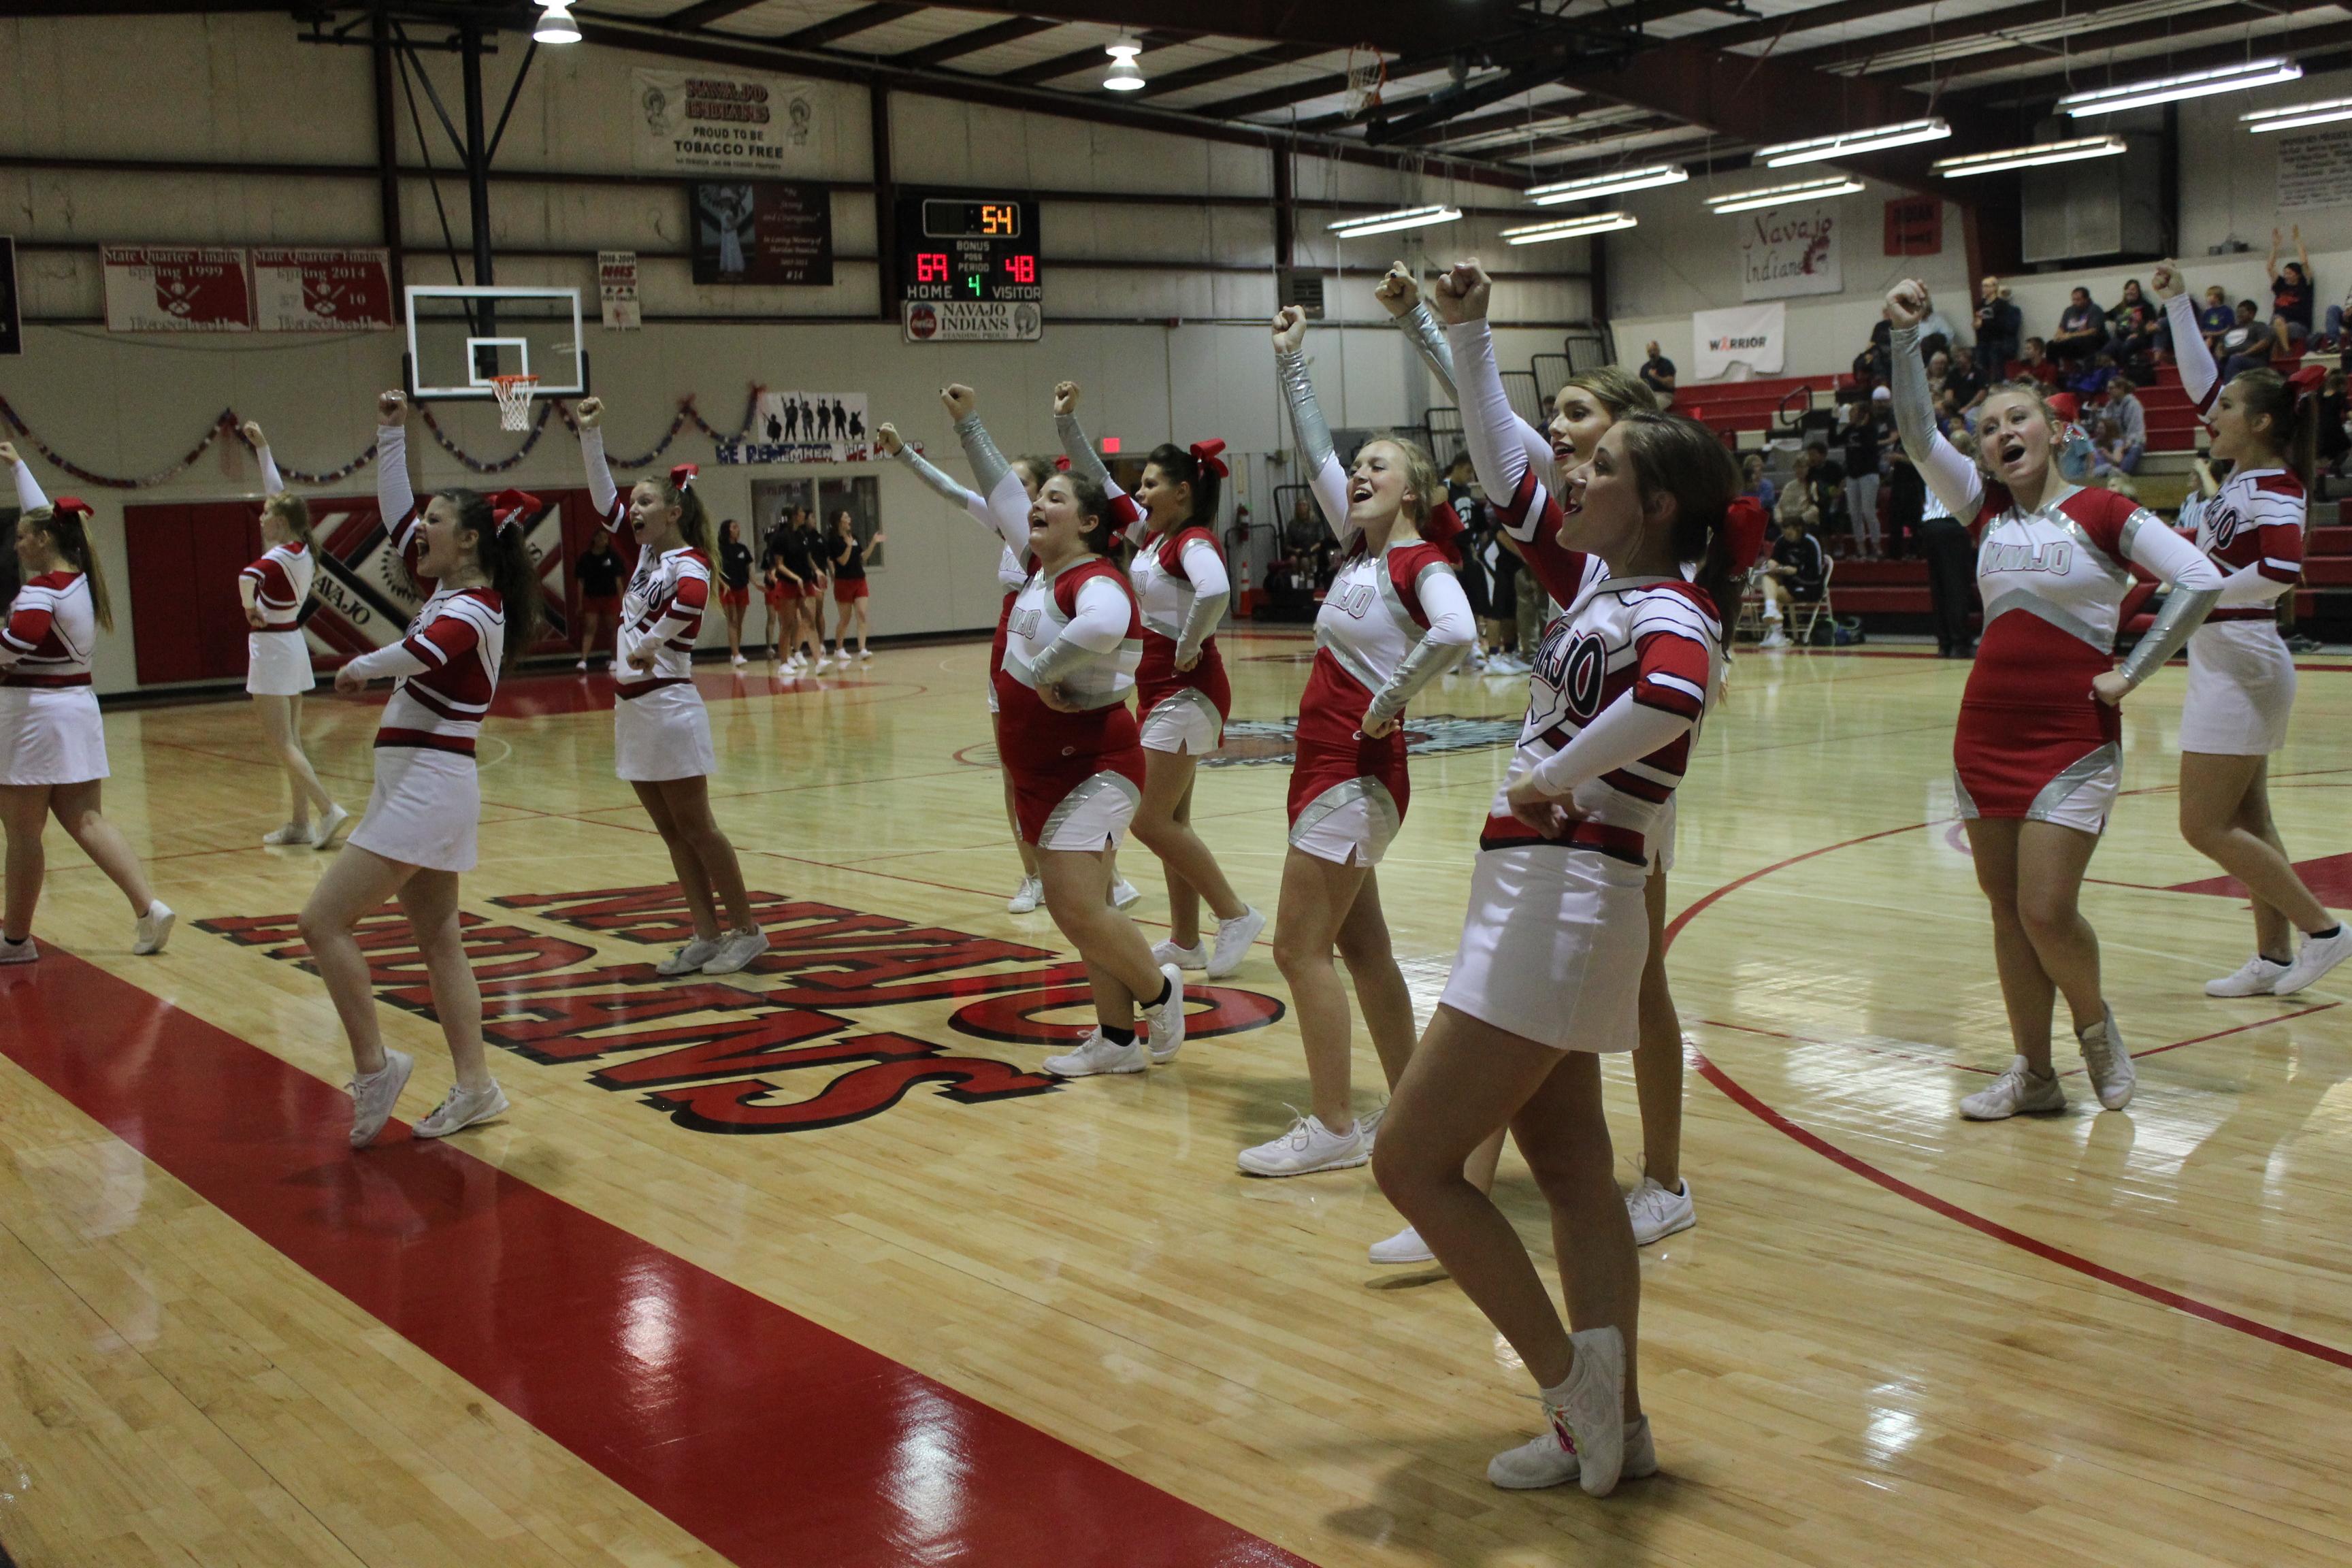 Cheerleaders-rally-the-crowd